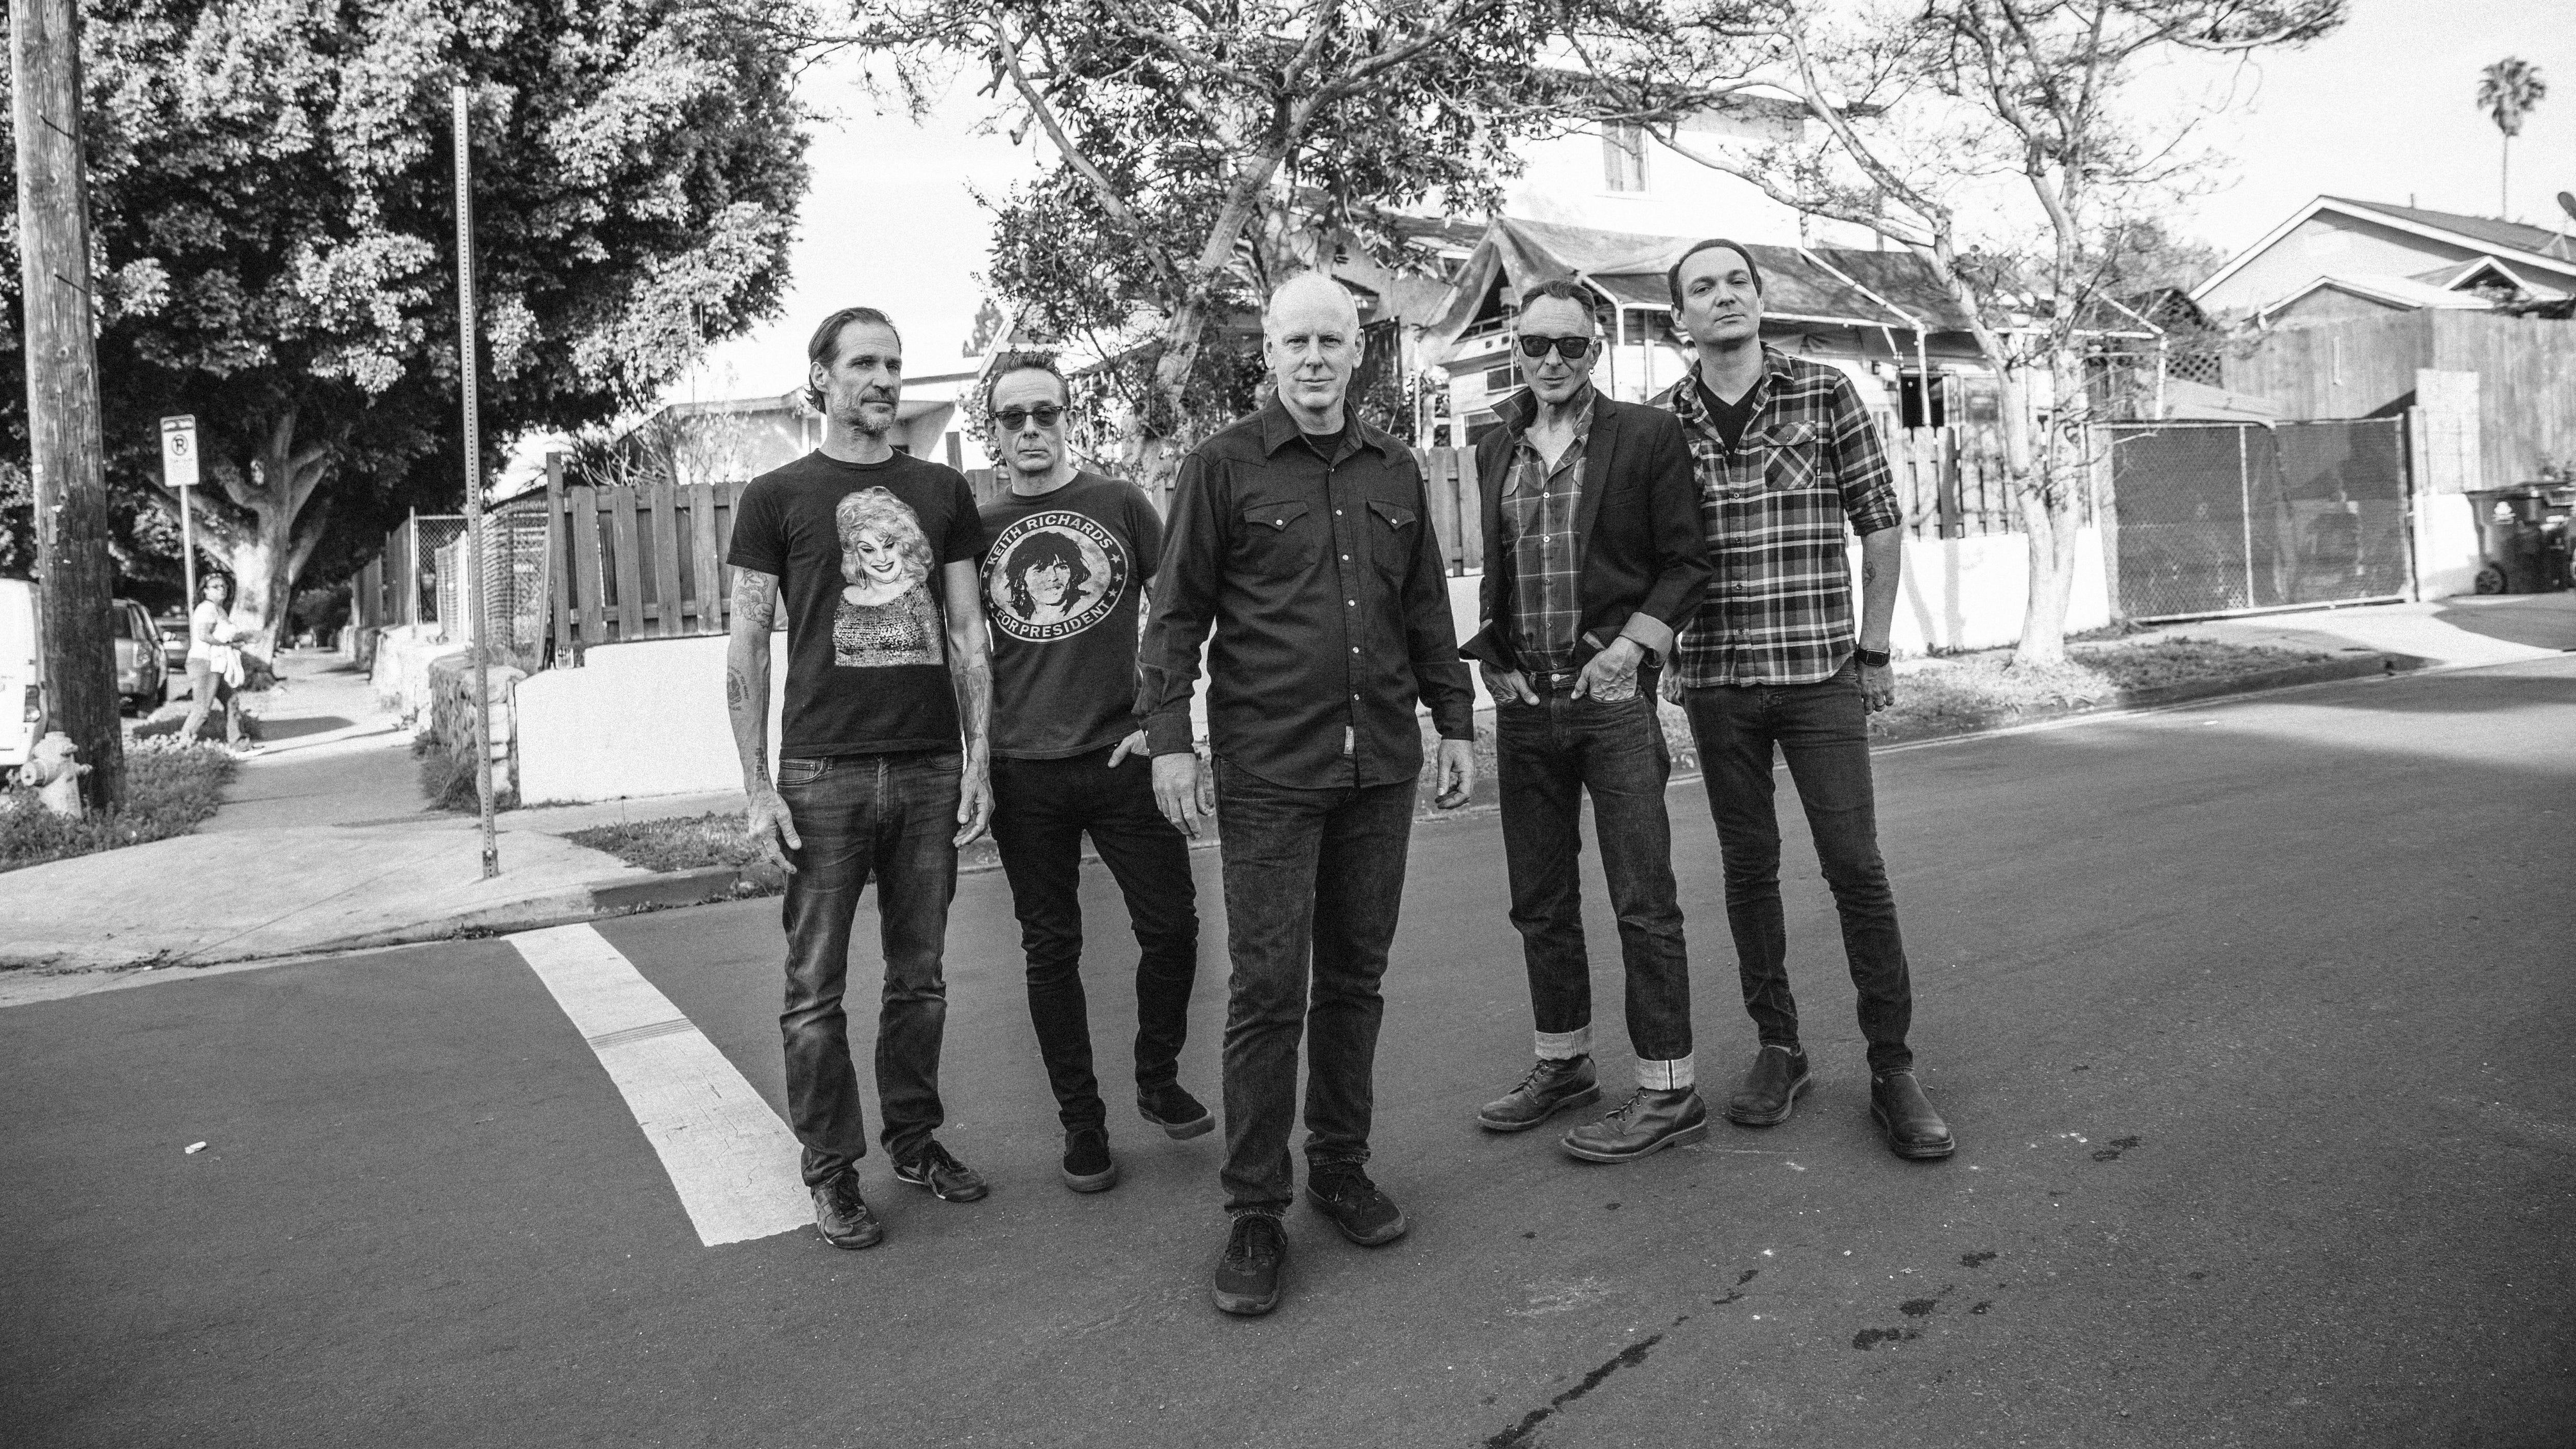 Bad Religion, Alkaline Trio tour playing Halloween